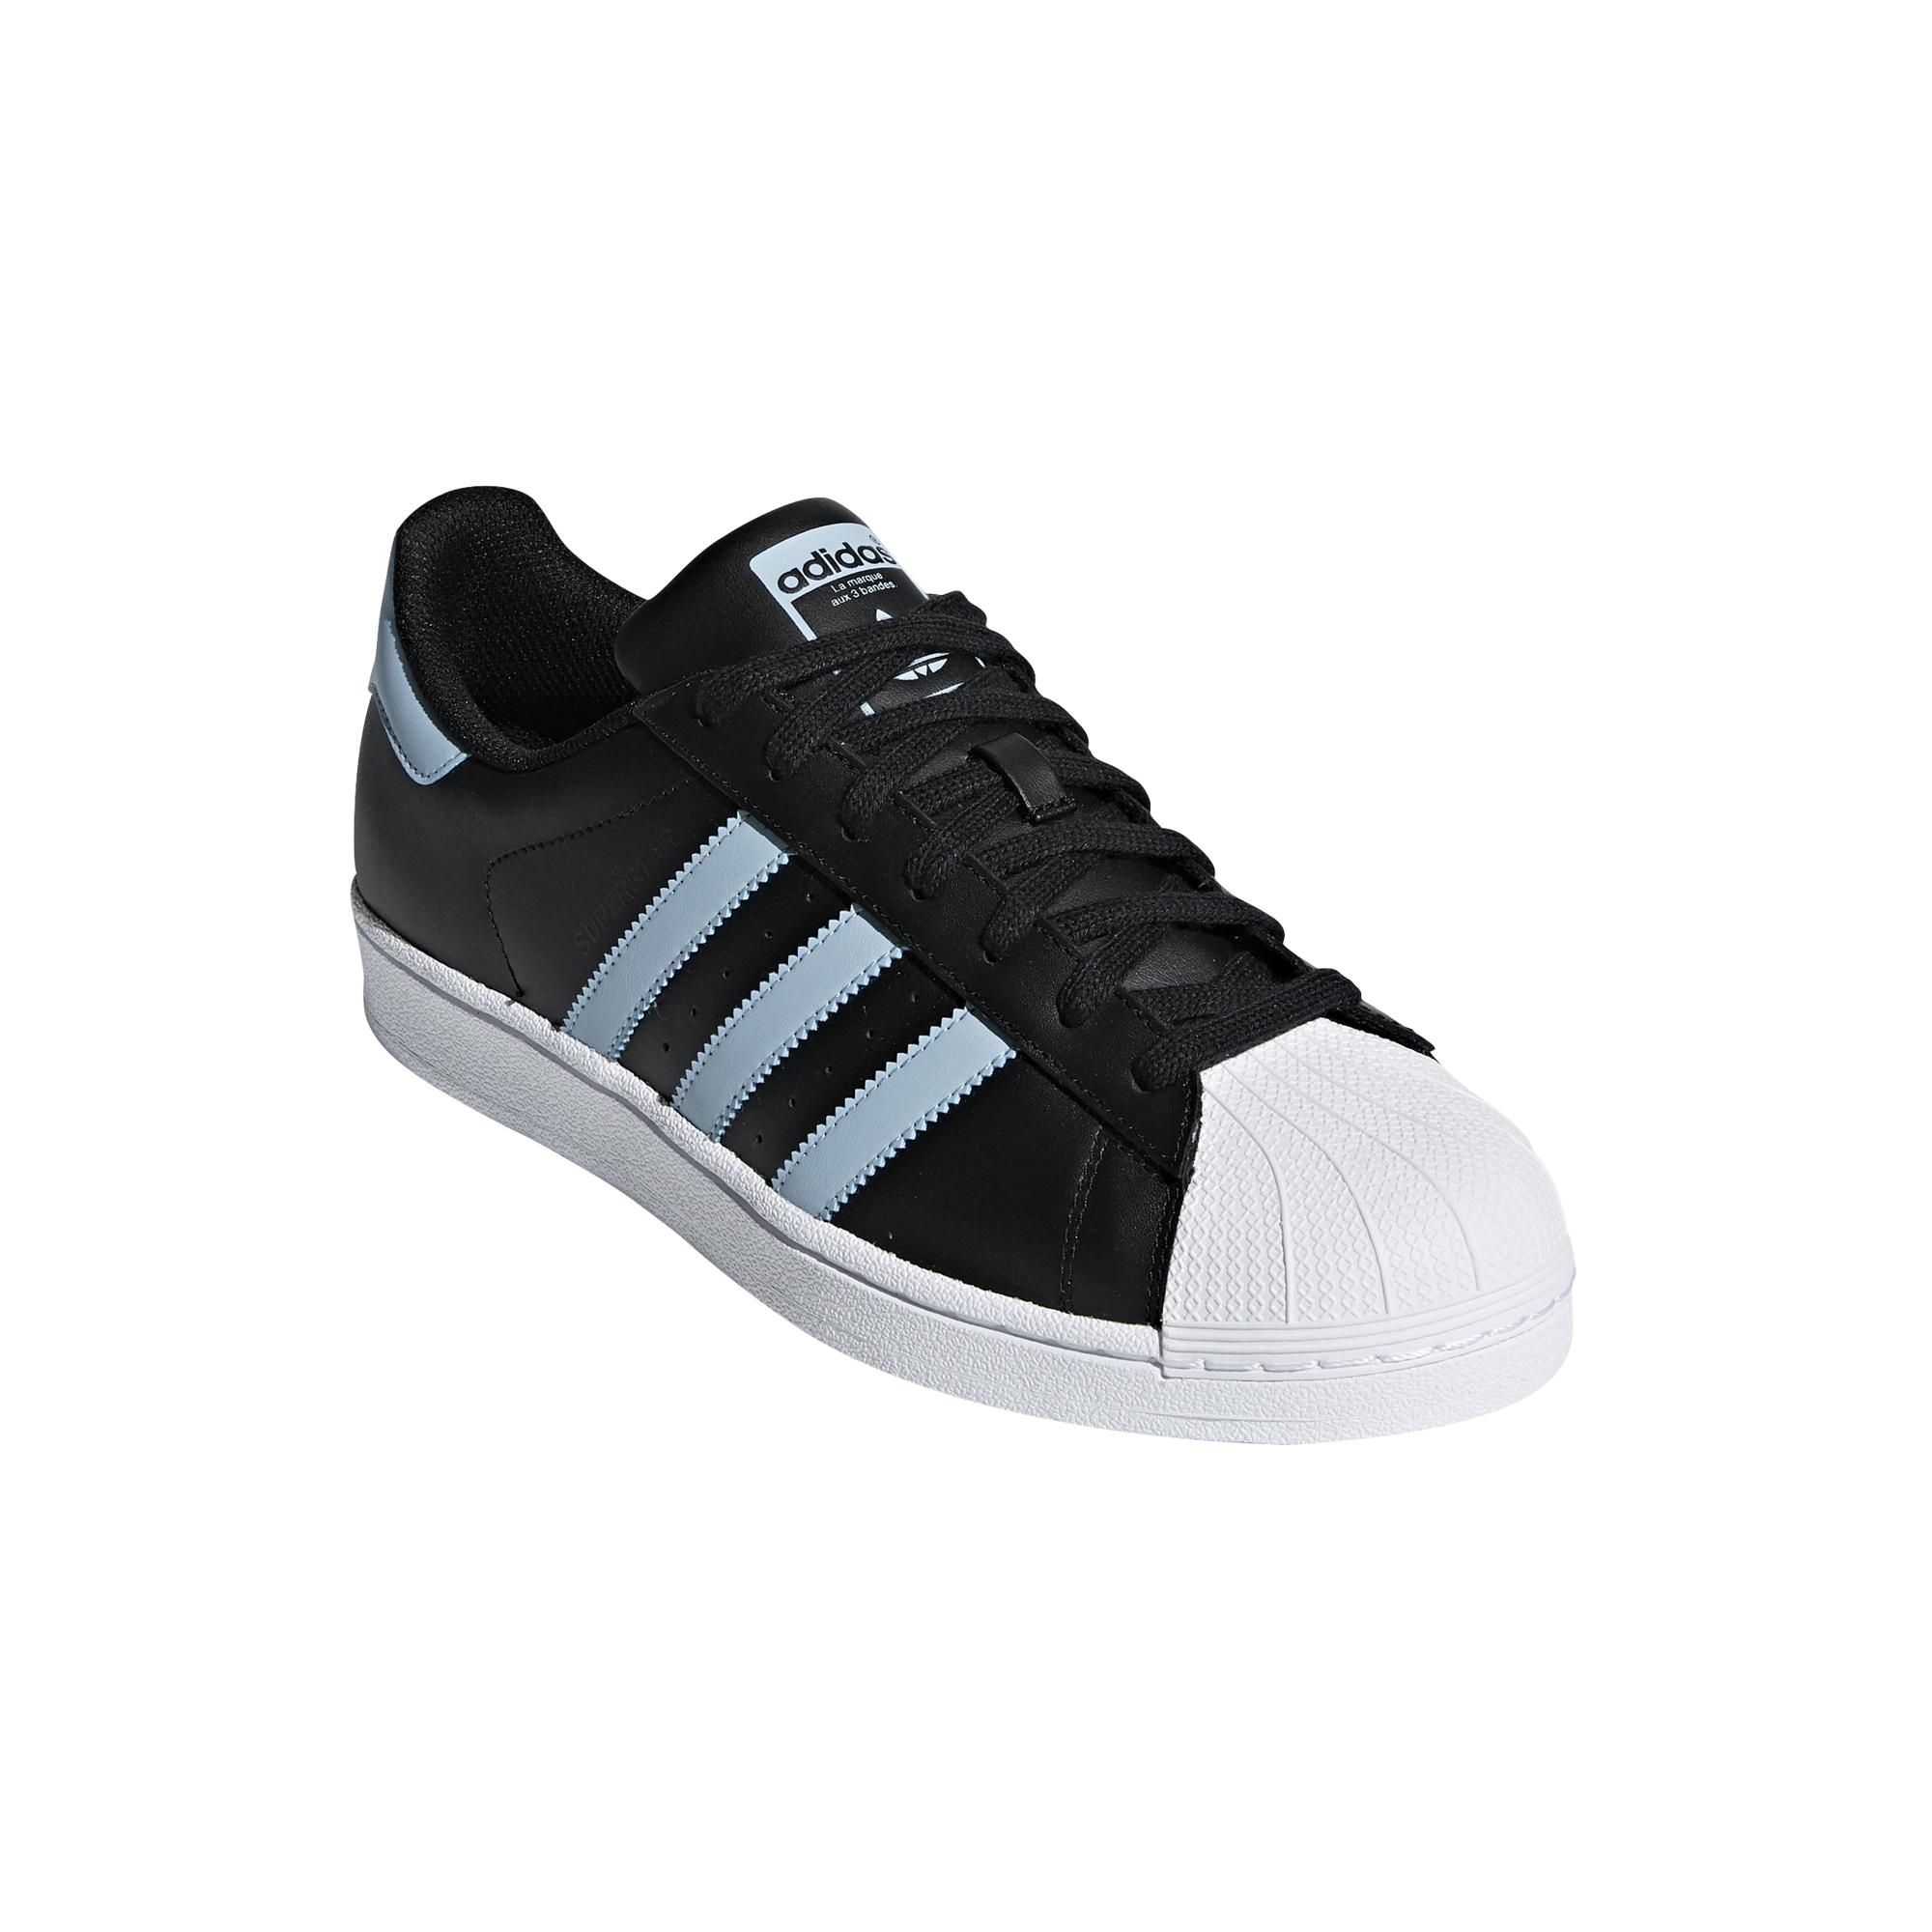 nouveau produit b75a1 f75f4 Chaussures adidas Superstar